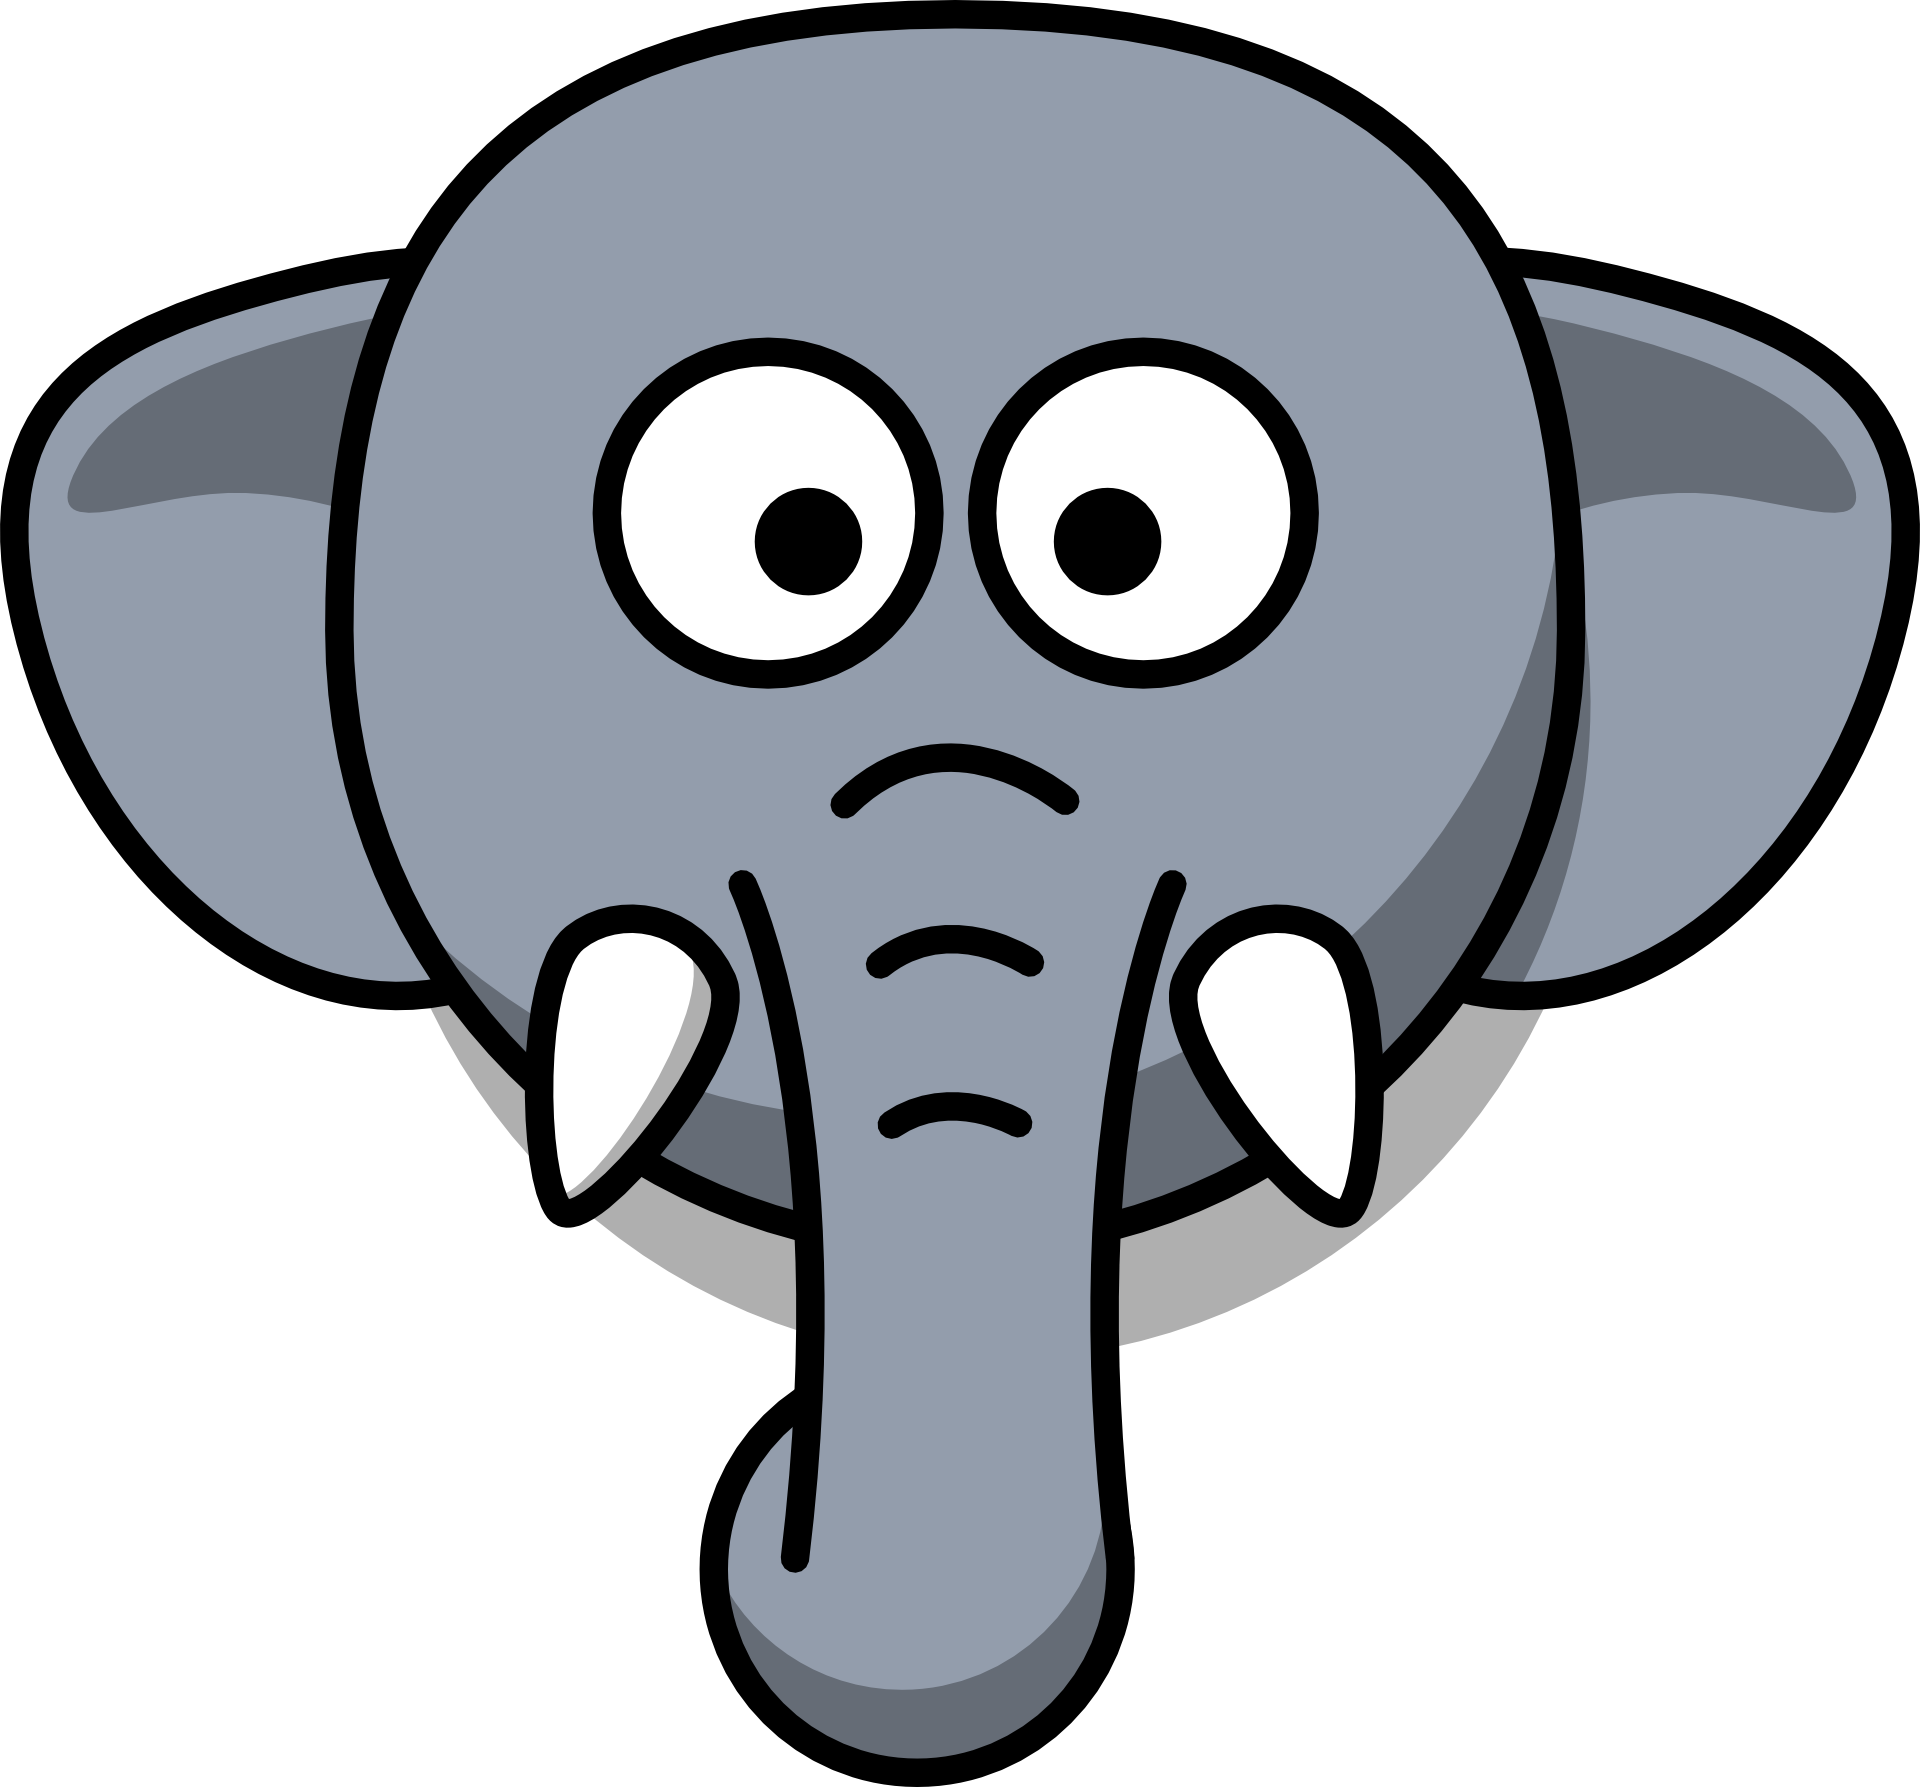 Kids Elephant Cartoon For Baby 1920x1080 Cartoon Elephant Elephant Elephant Face